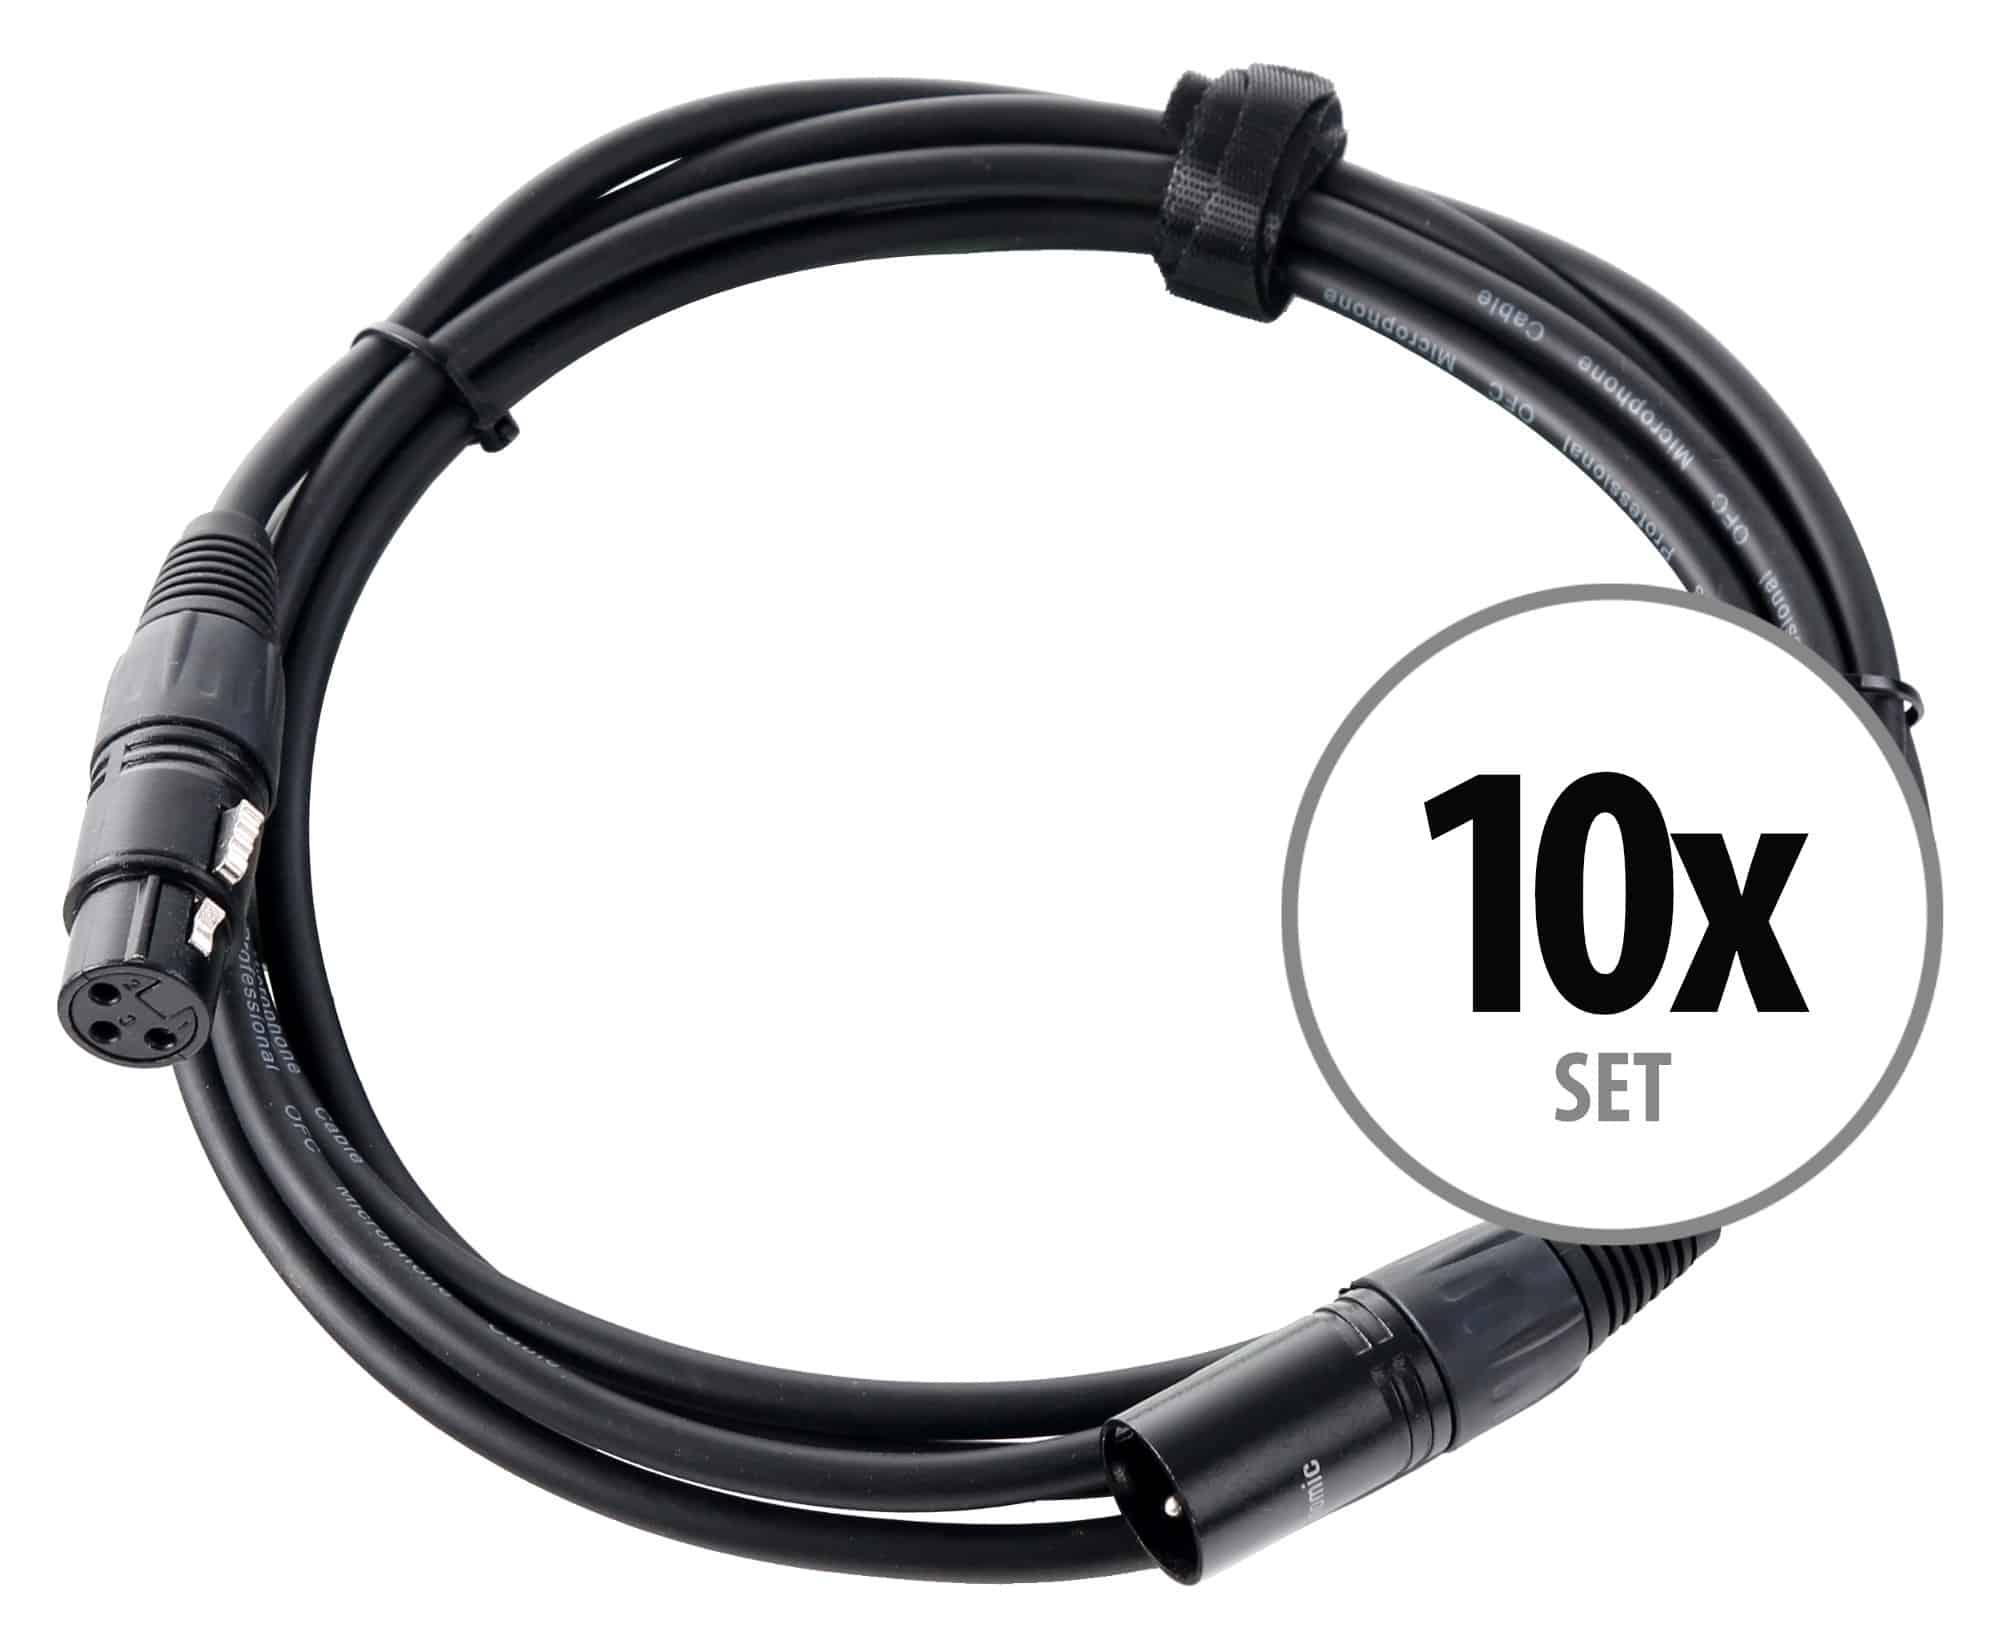 10er Set Pronomic Stage XFXM 2.5 Mikrofonkabel XLR 2,5 m Schwarz